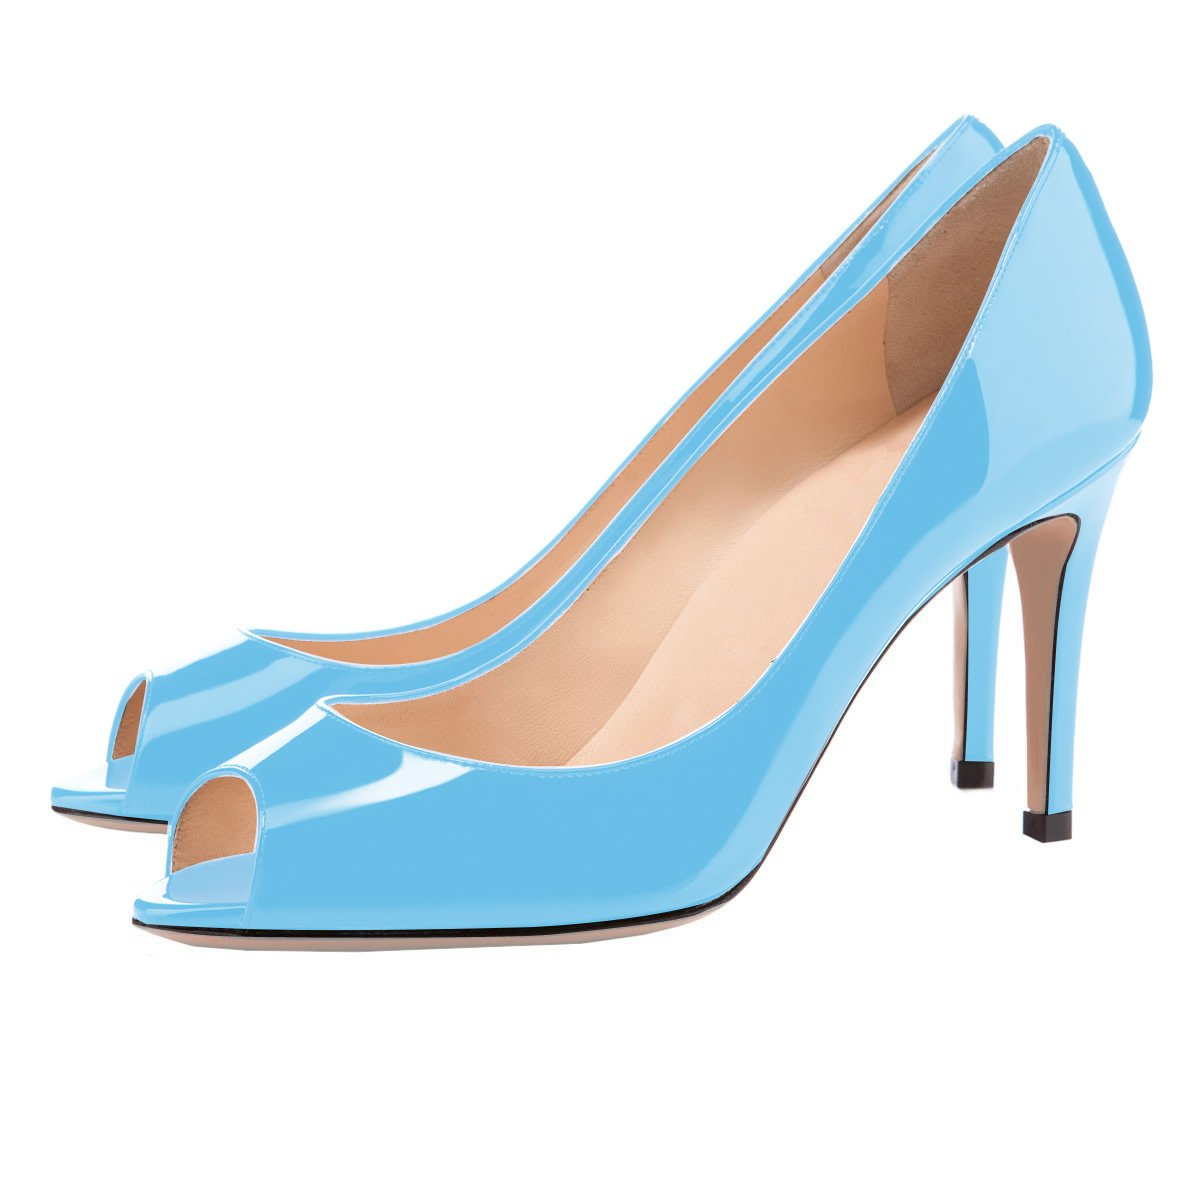 Eldof Women Peep Toe Pumps Mid-Heel Pumps Formal Wedding Toe Bridal Classic Heel Open Toe Wedding Stiletto B07F1Q5Y9S 12.5 B(M) US|Blue 593fd5